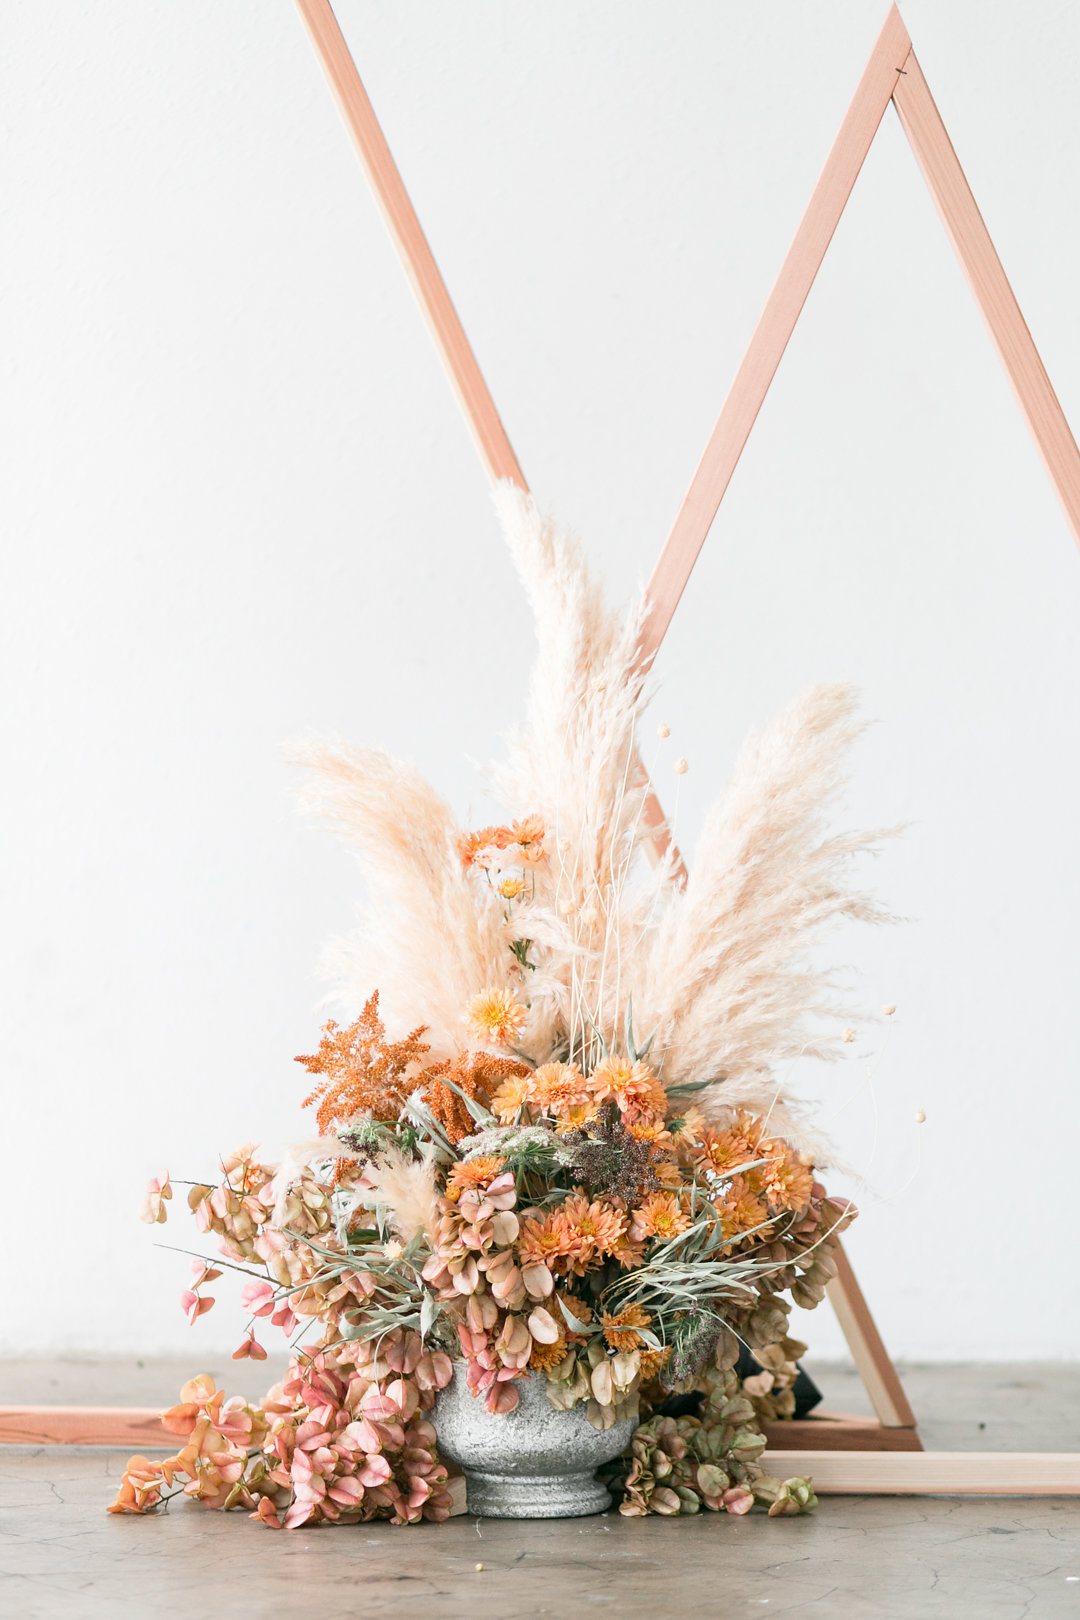 Installation_Florals_Fall_Texture_Sibyl_Sophia_Triange.jpg